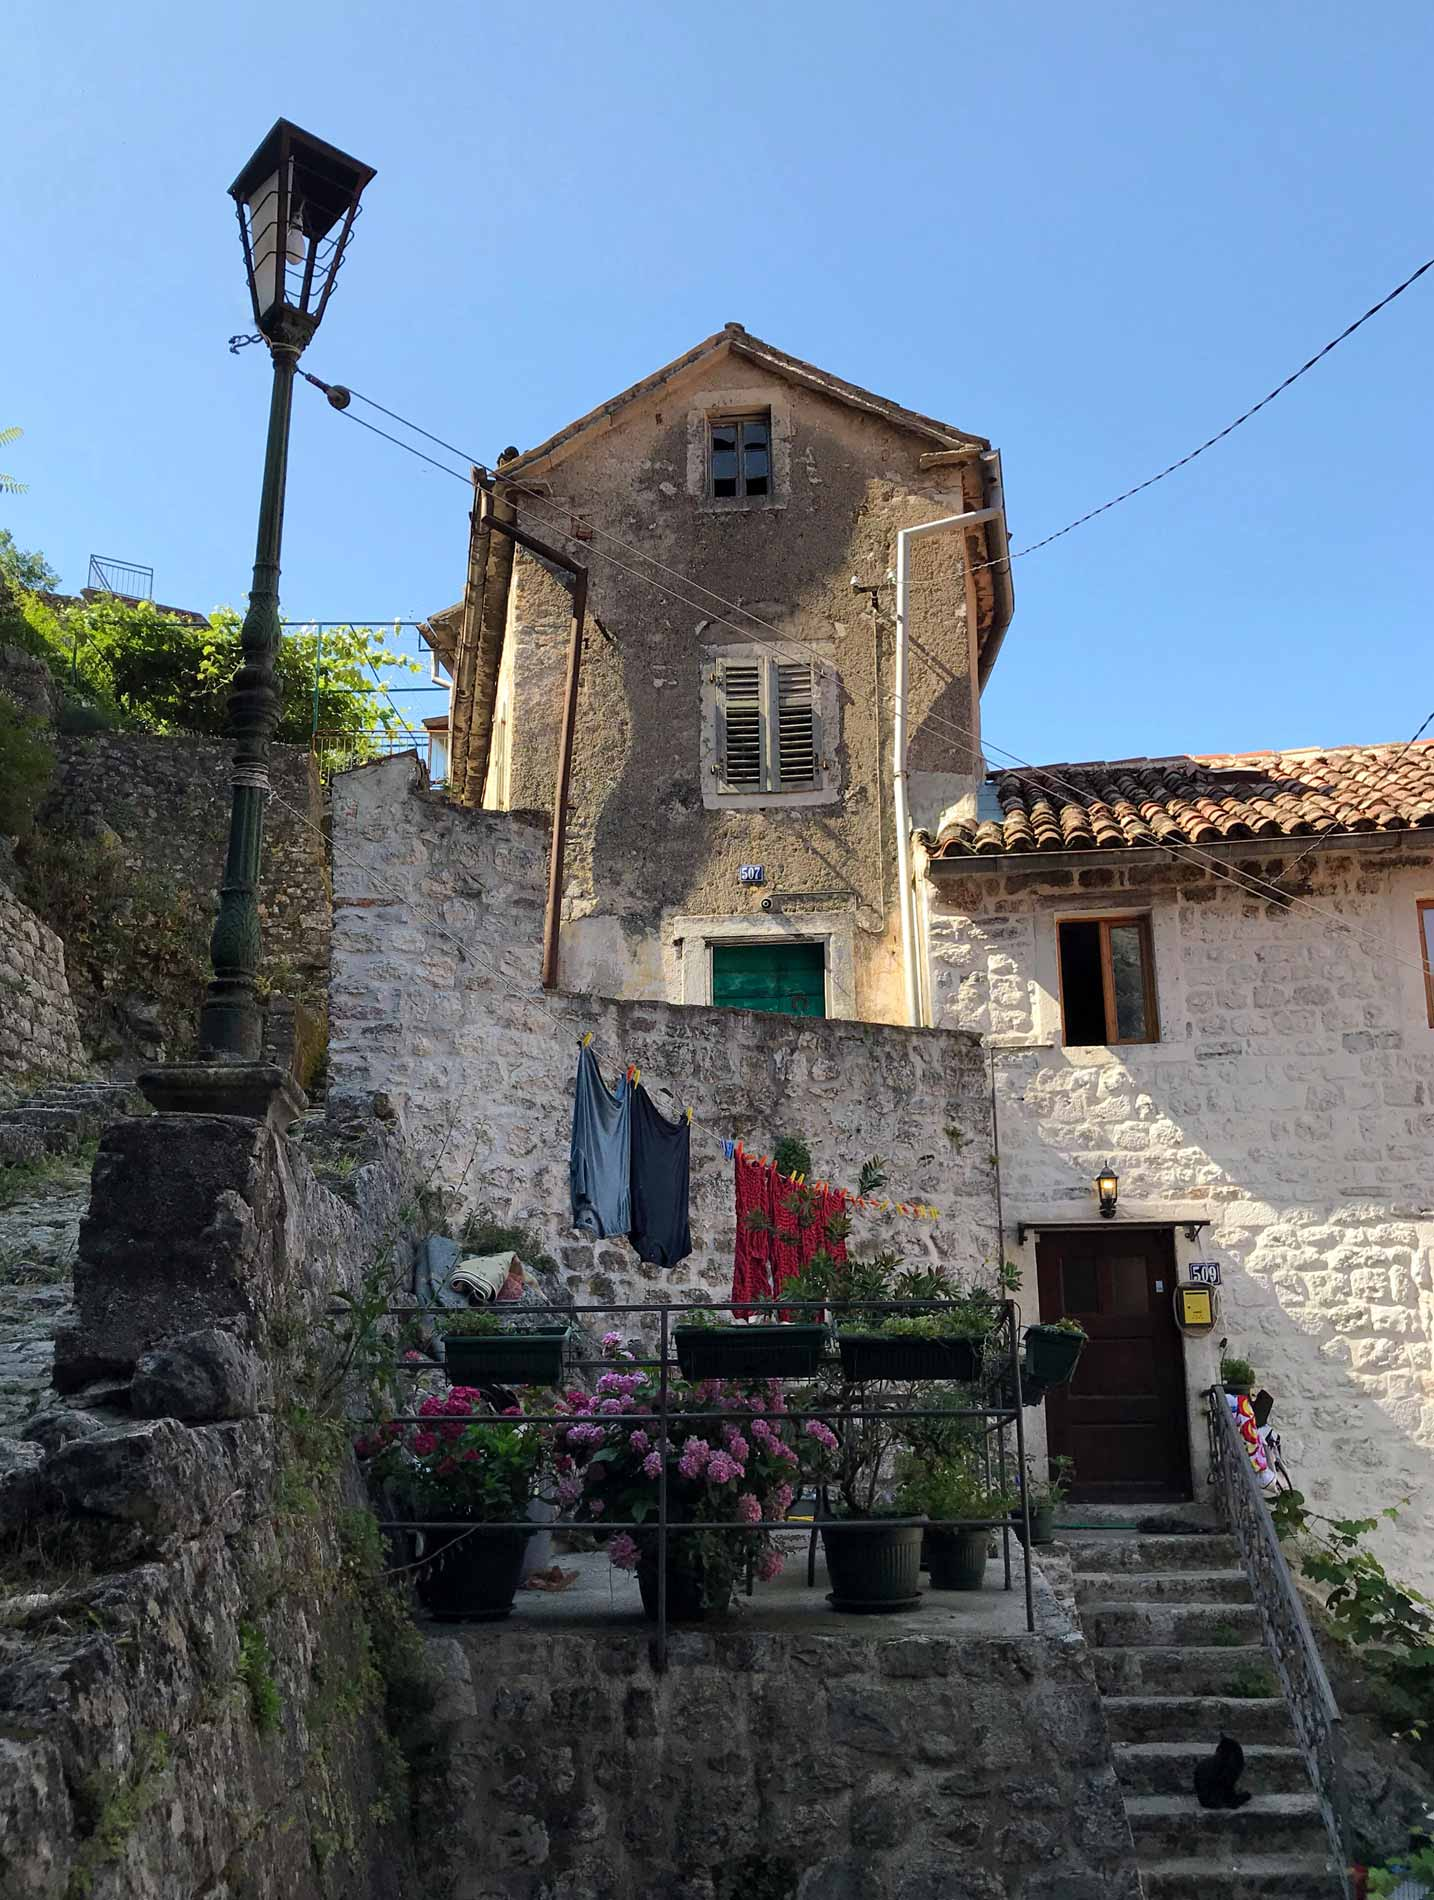 Kotor-Montenegro-casa-panni-stesi-finestre-scalinata-colle-san-giovanni